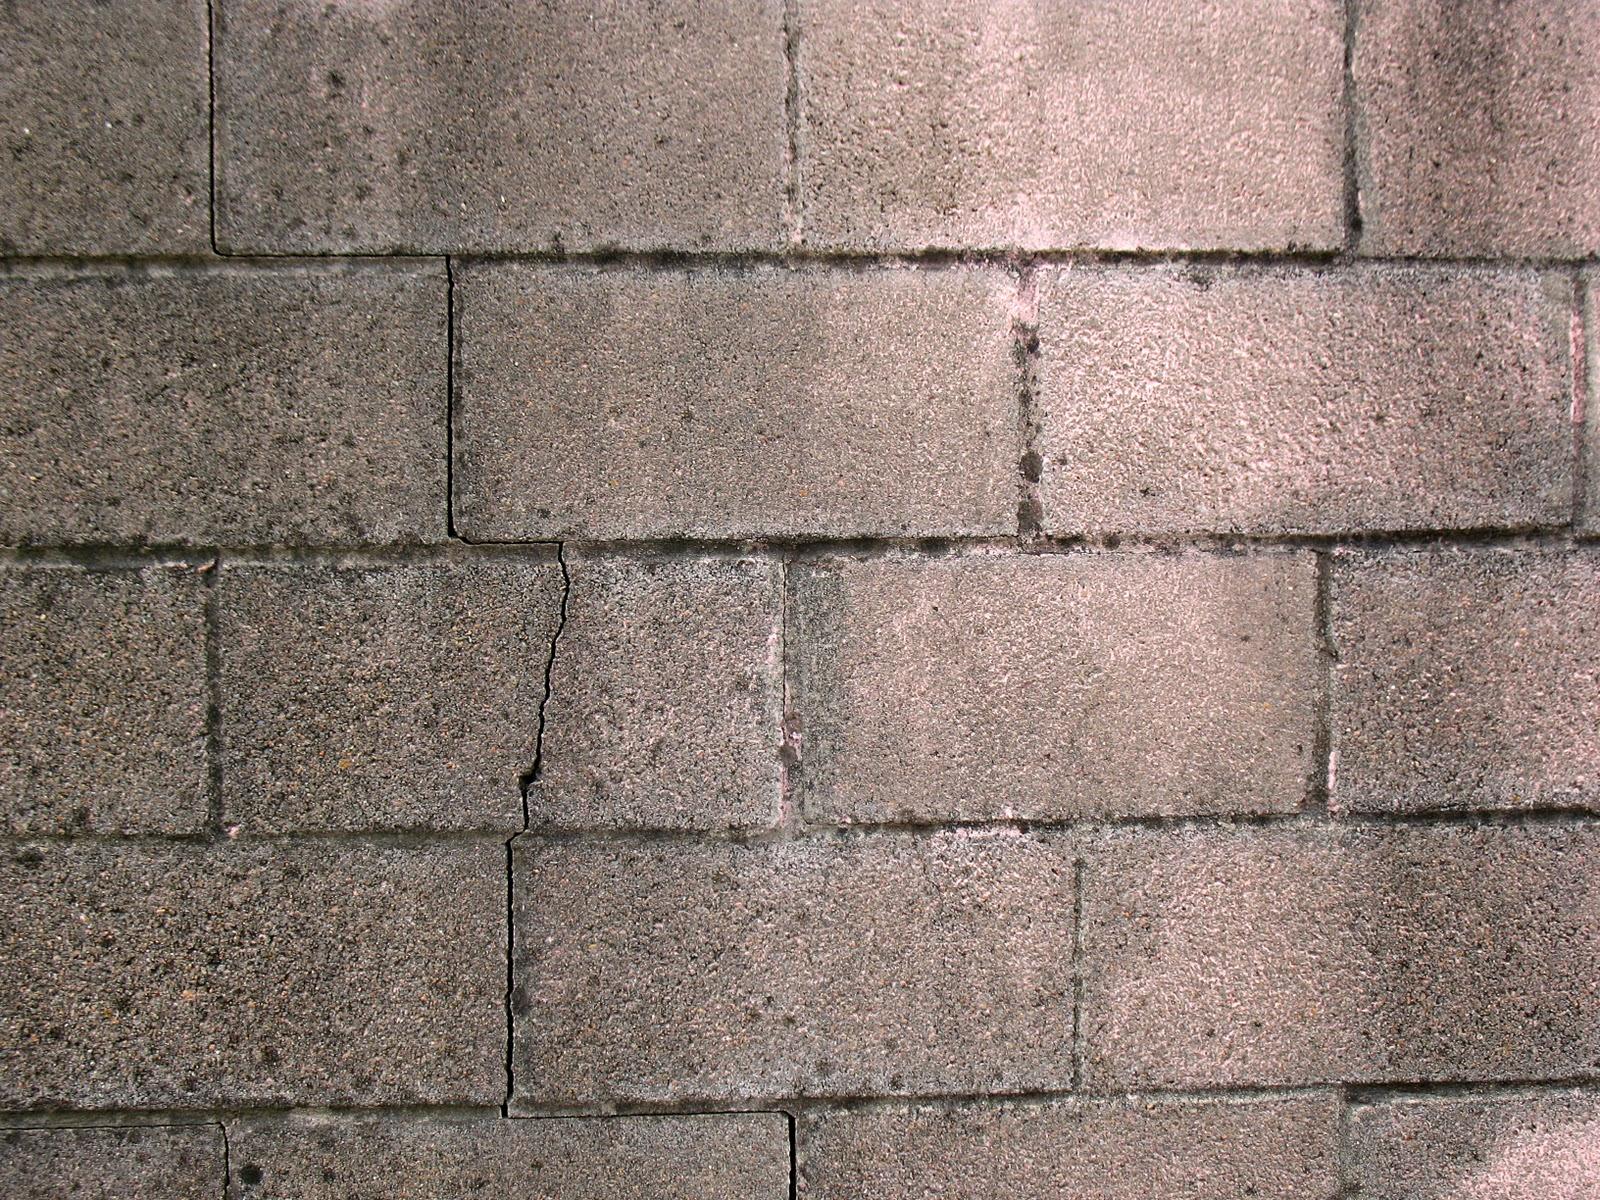 http://3.bp.blogspot.com/_5YQzFd7SgnI/TTiAFuHfQeI/AAAAAAAAAxI/DuZwRT3S5jA/s1600/Stone+wall+texture+3.jpg